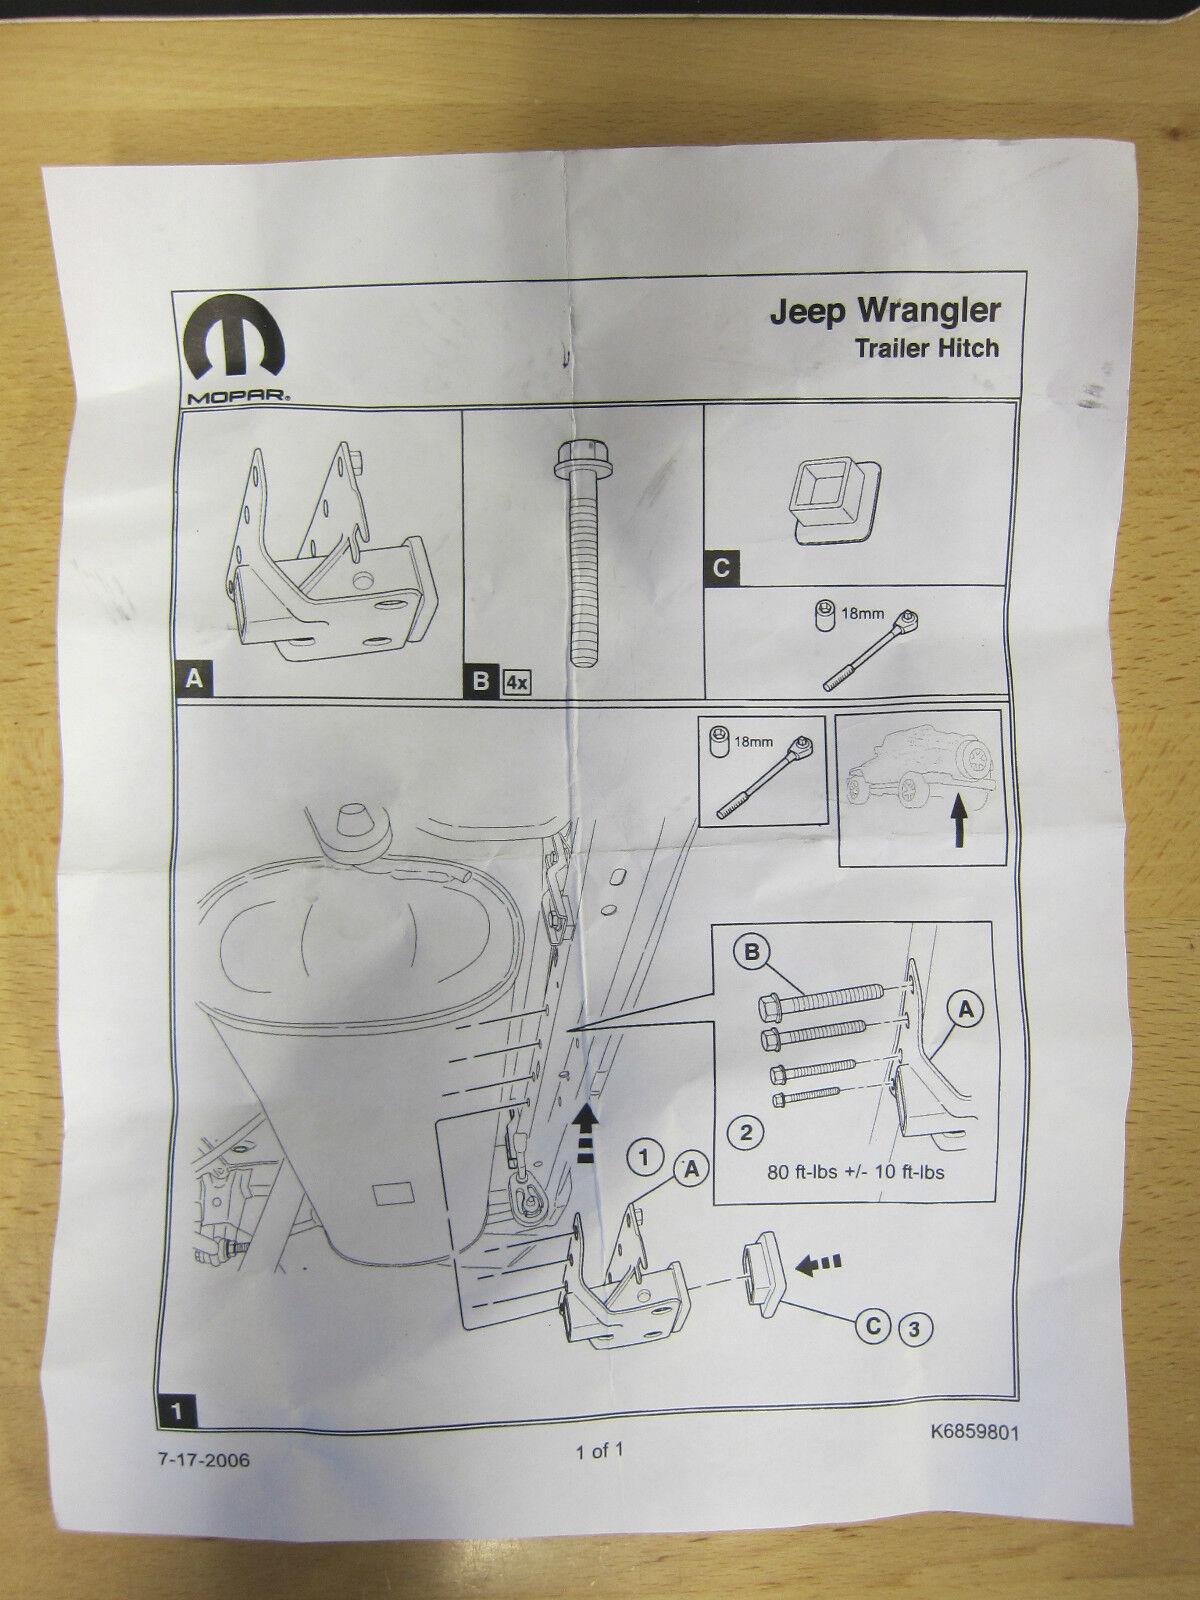 Nett Jeep Wrangler Schaltplan Galerie - Verdrahtungsideen - korsmi.info